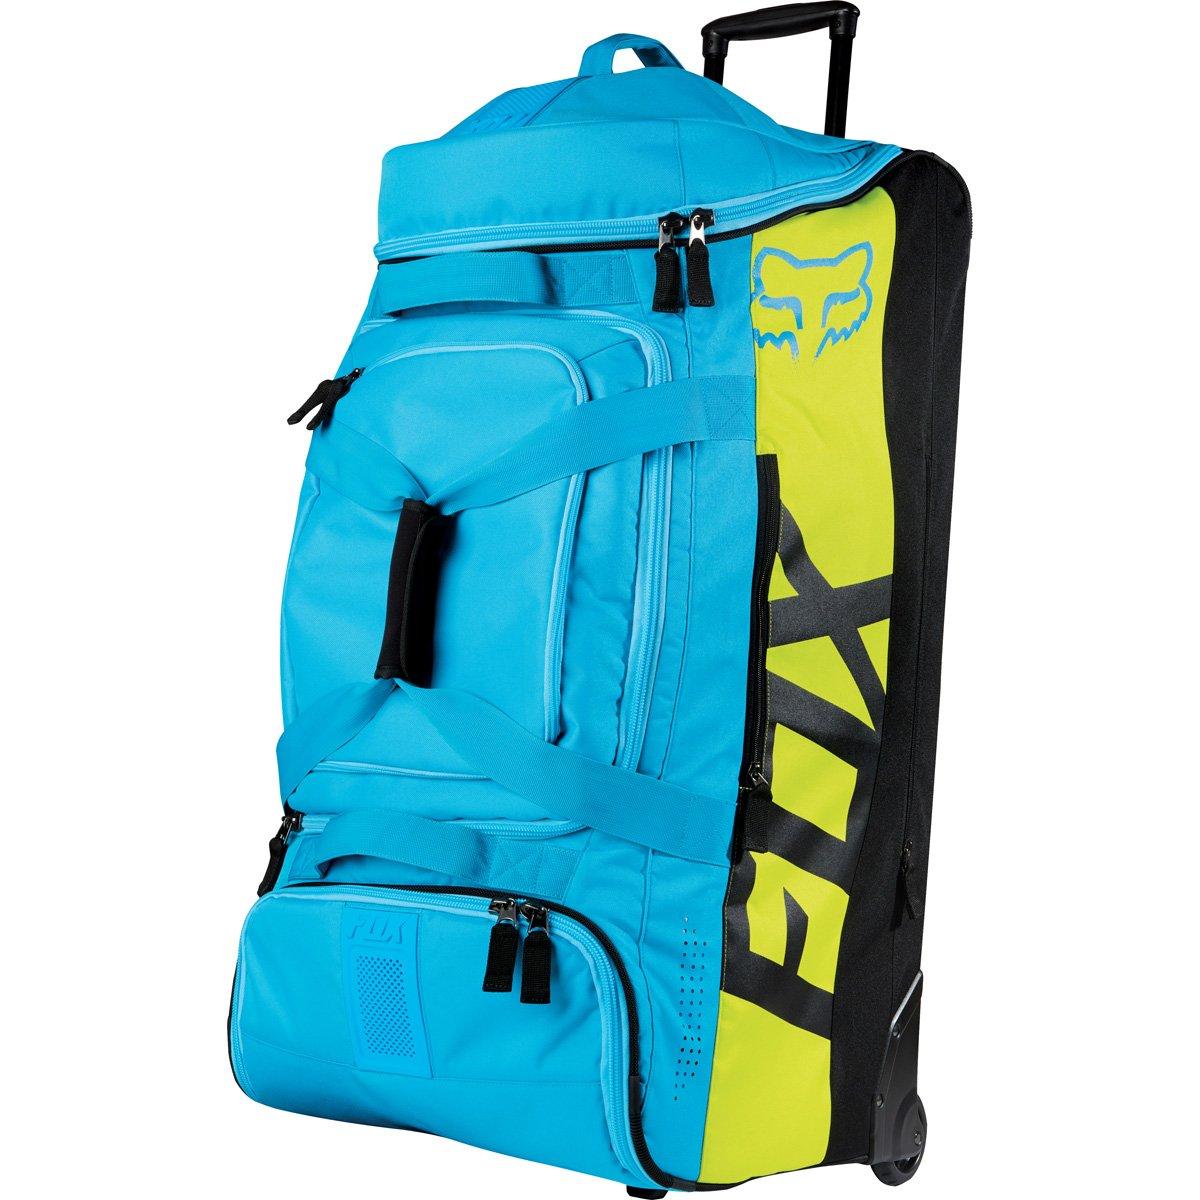 Fox Racing Shuttle Roller Print Sports Gear Bag - Blue/Yellow / One Size